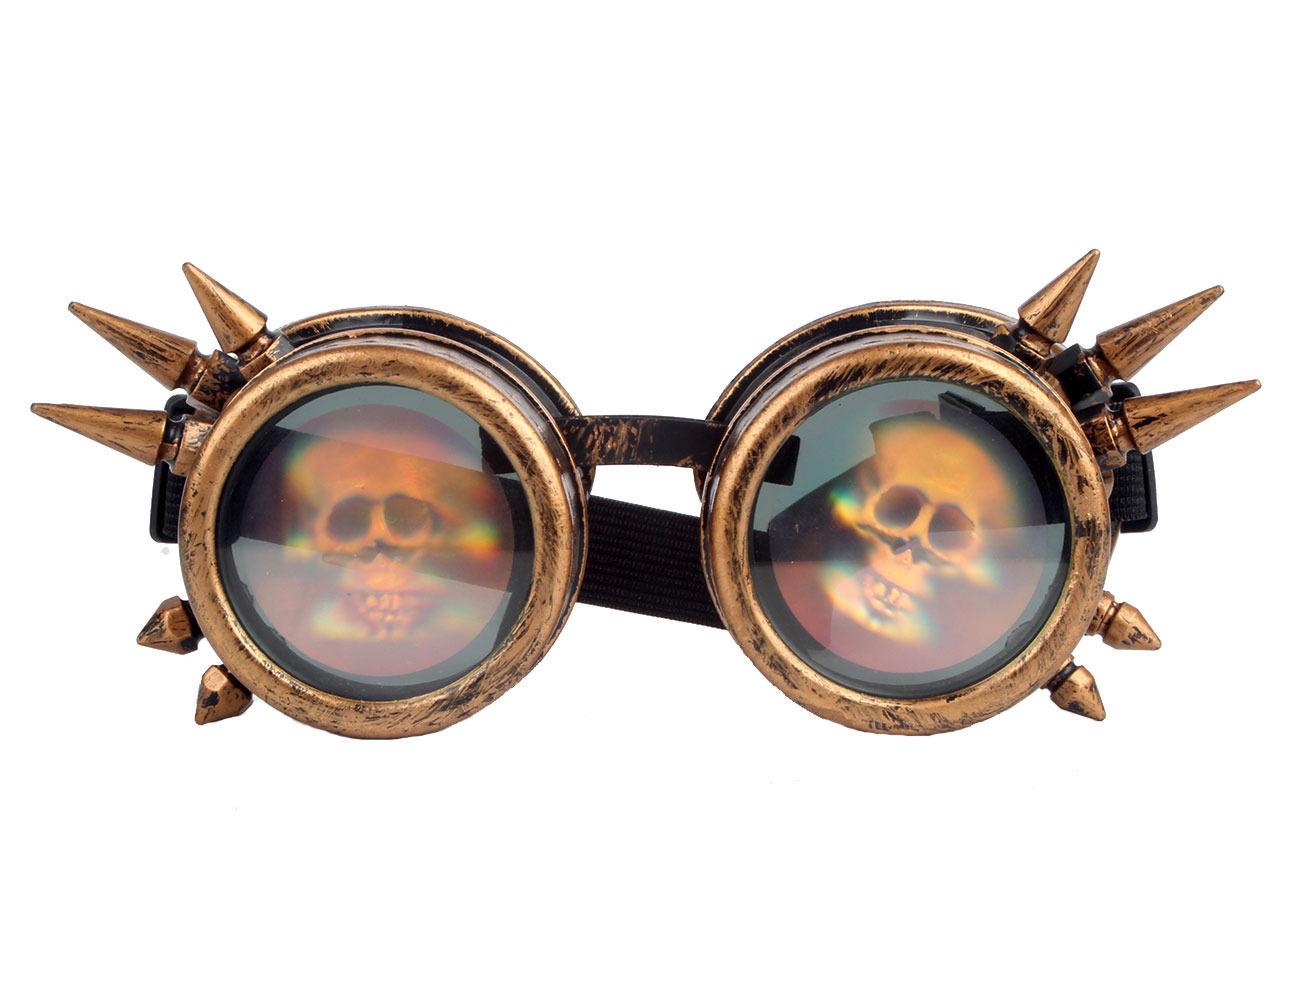 Multicolor Victorian Steampunk Eyewear Goggles Welding Cosplay Vintage Glasses | eBay